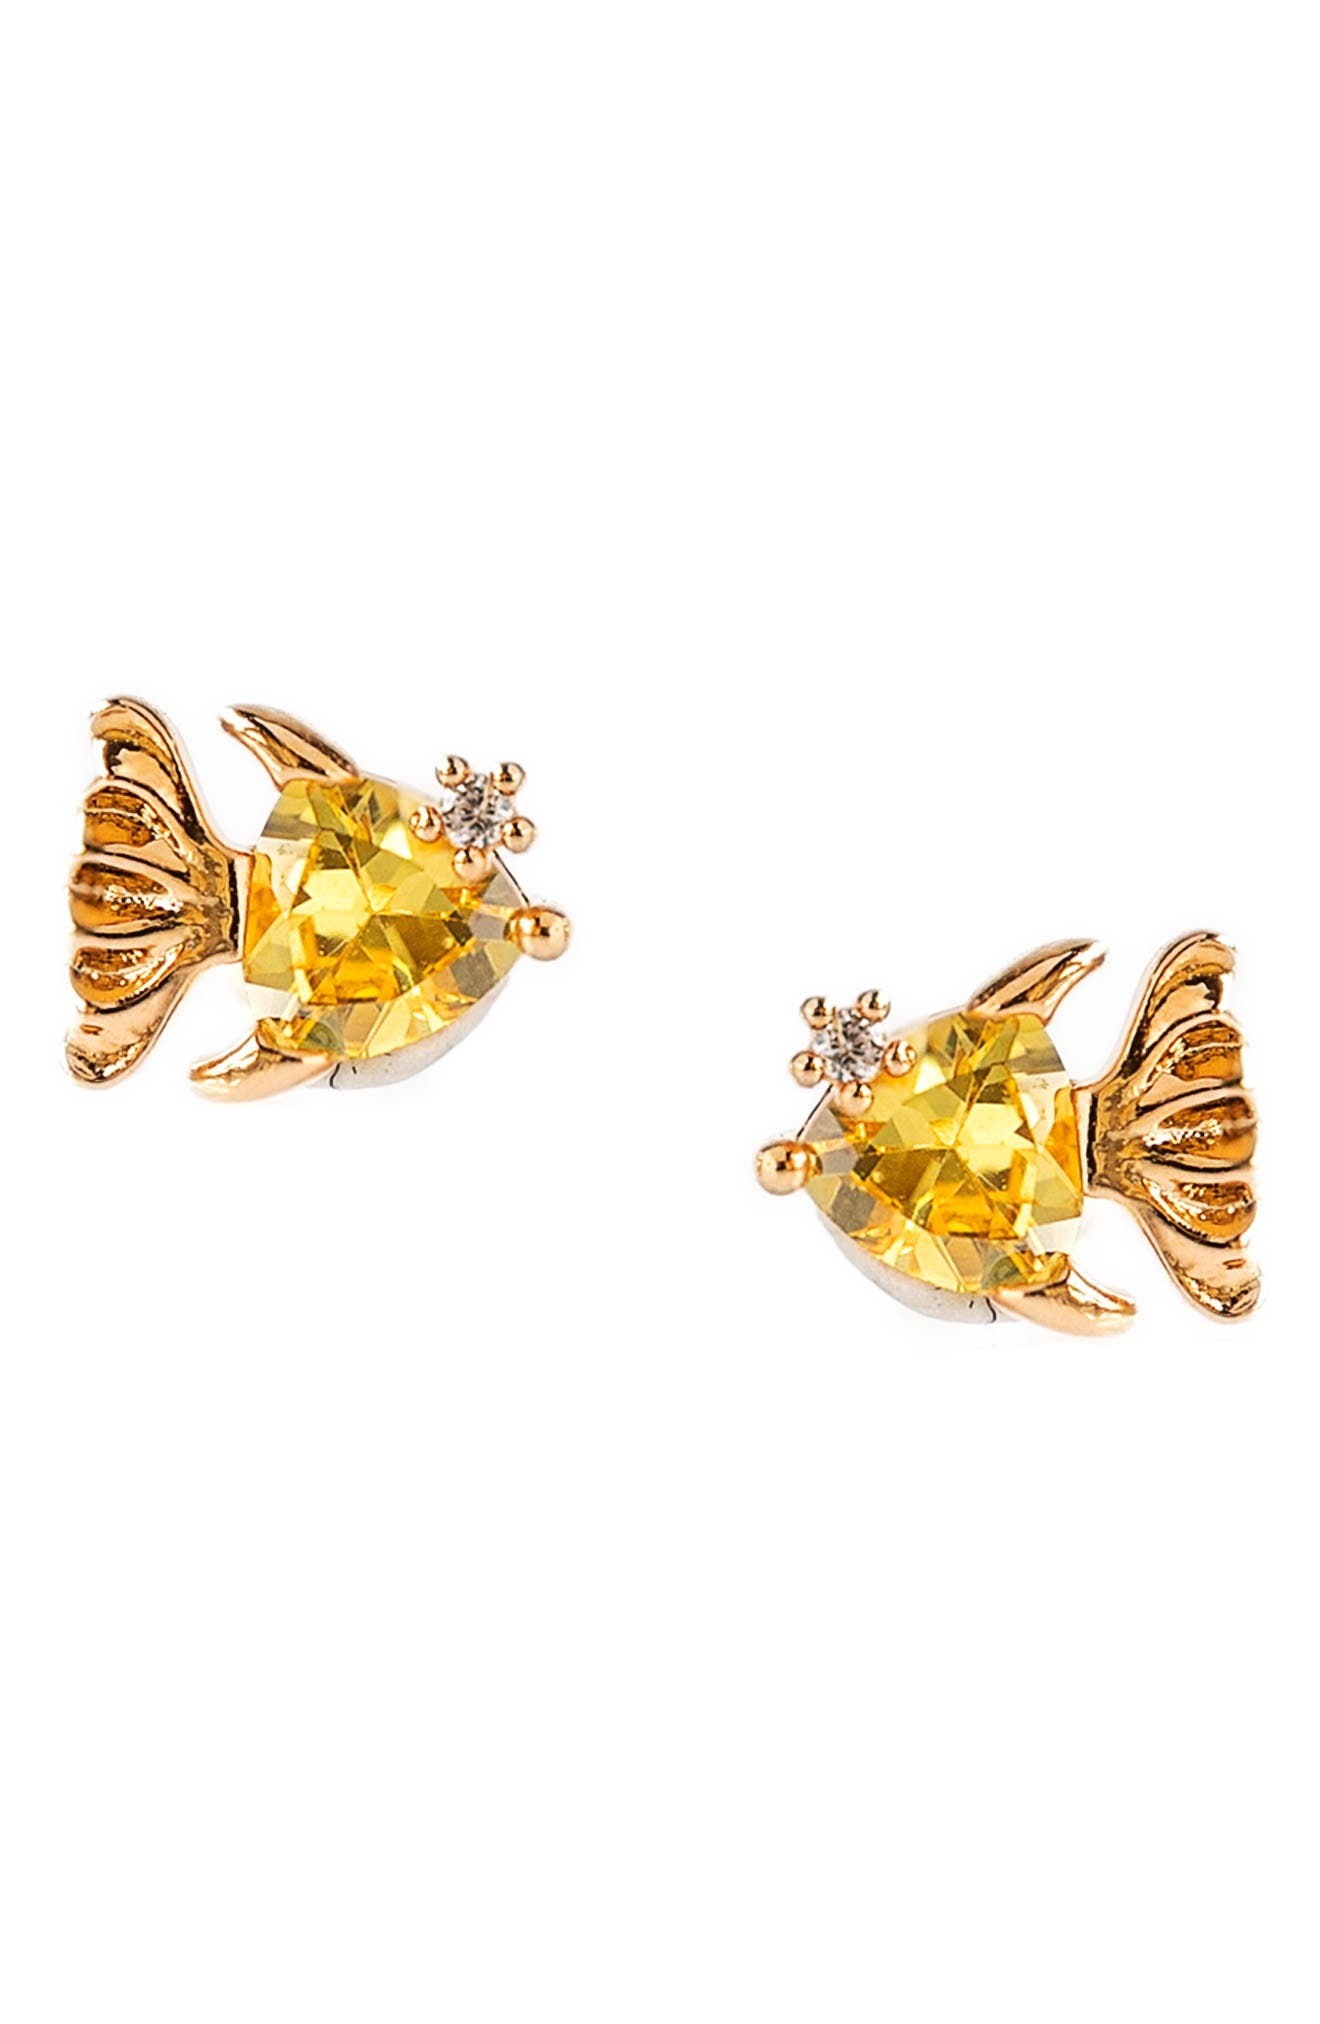 Go Fish Stud Earrings